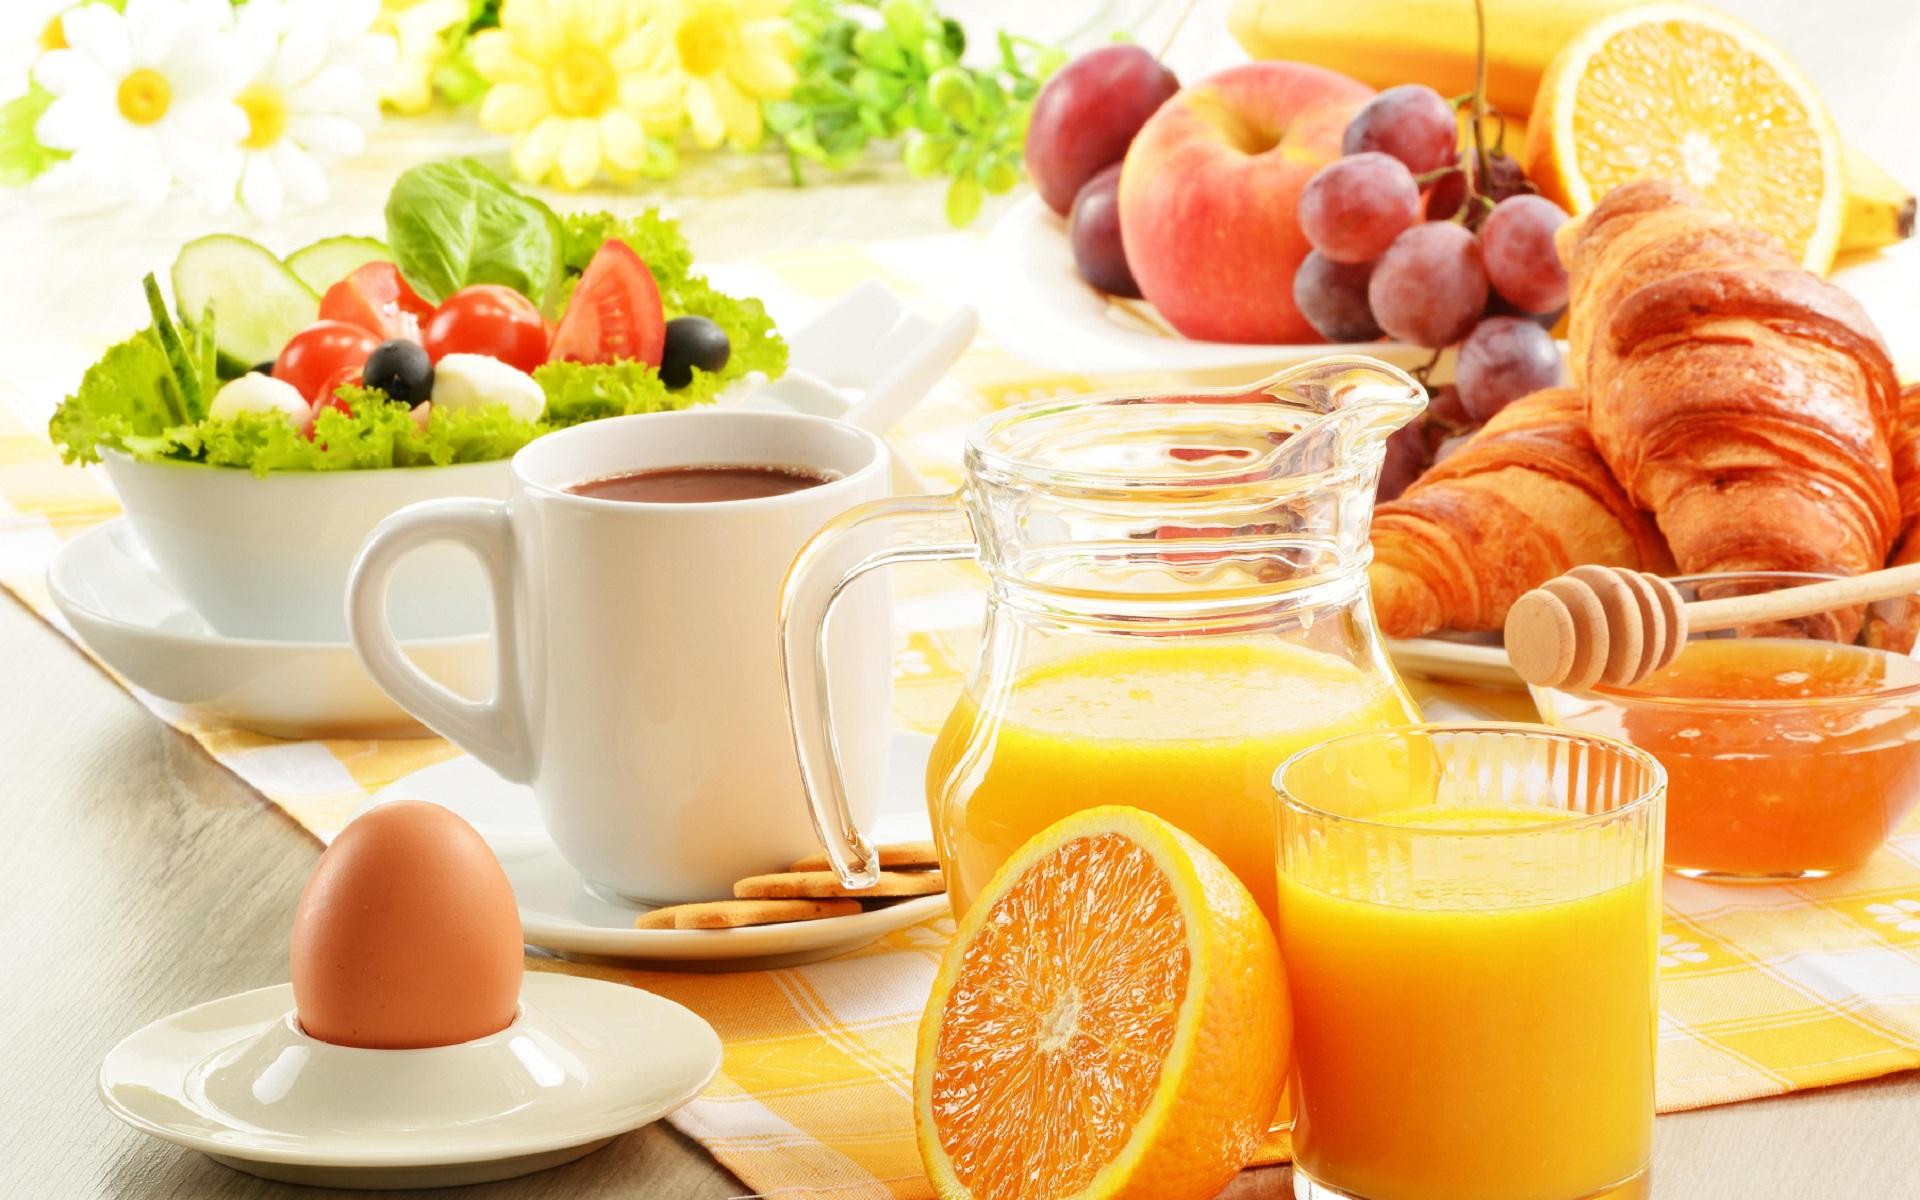 Healthy Breakfast In A Hot Summer Day